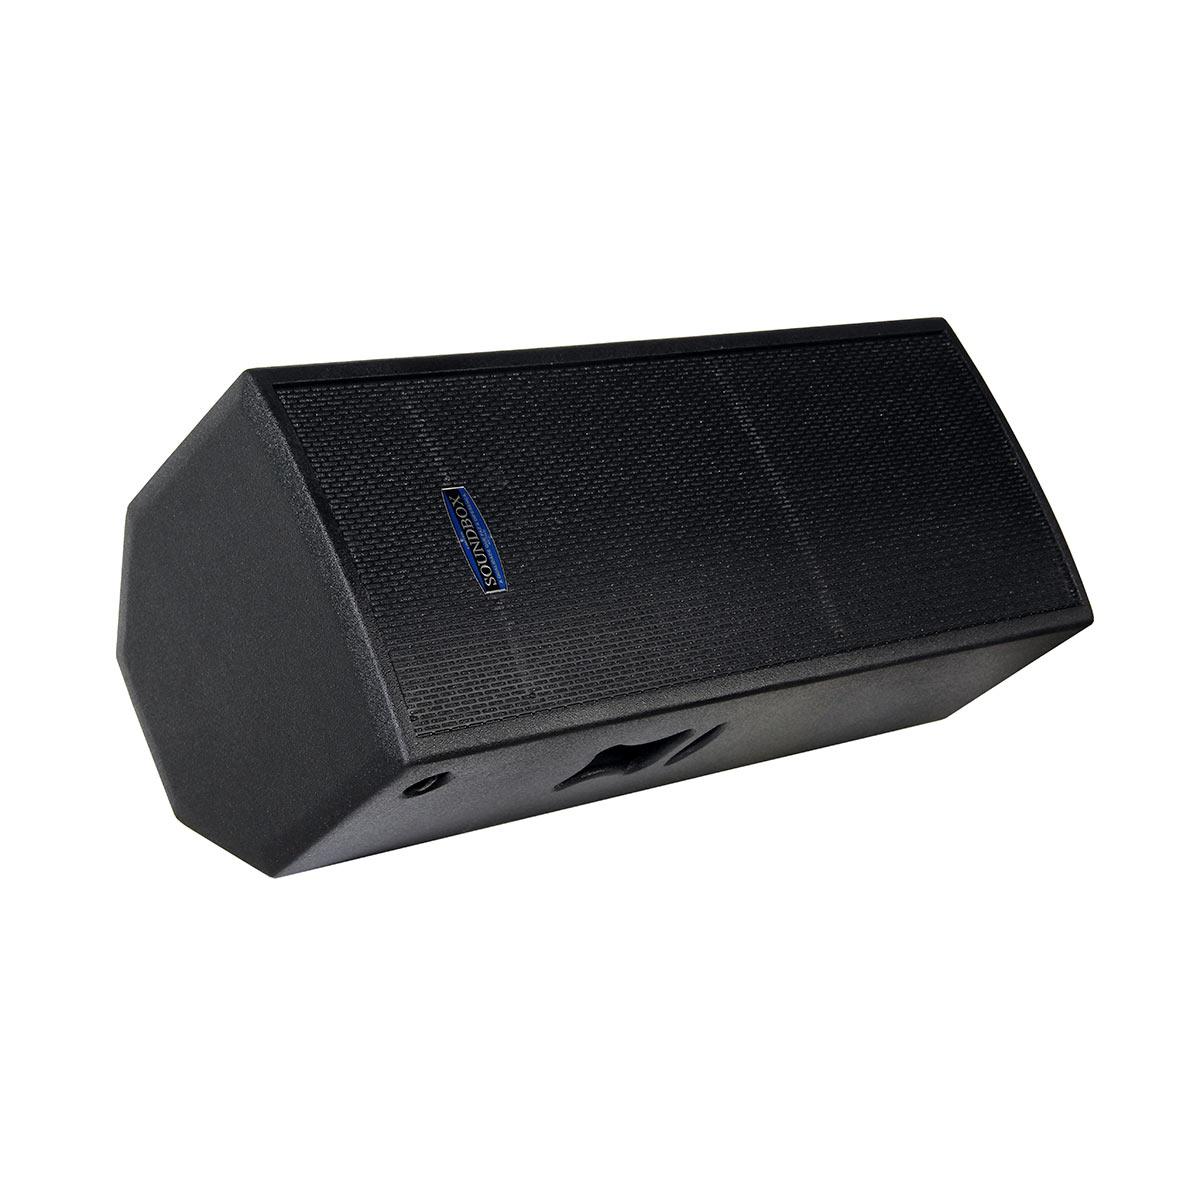 MS15 - Caixa Ativa 800W MS 15 Dupla Preta - SoundBox